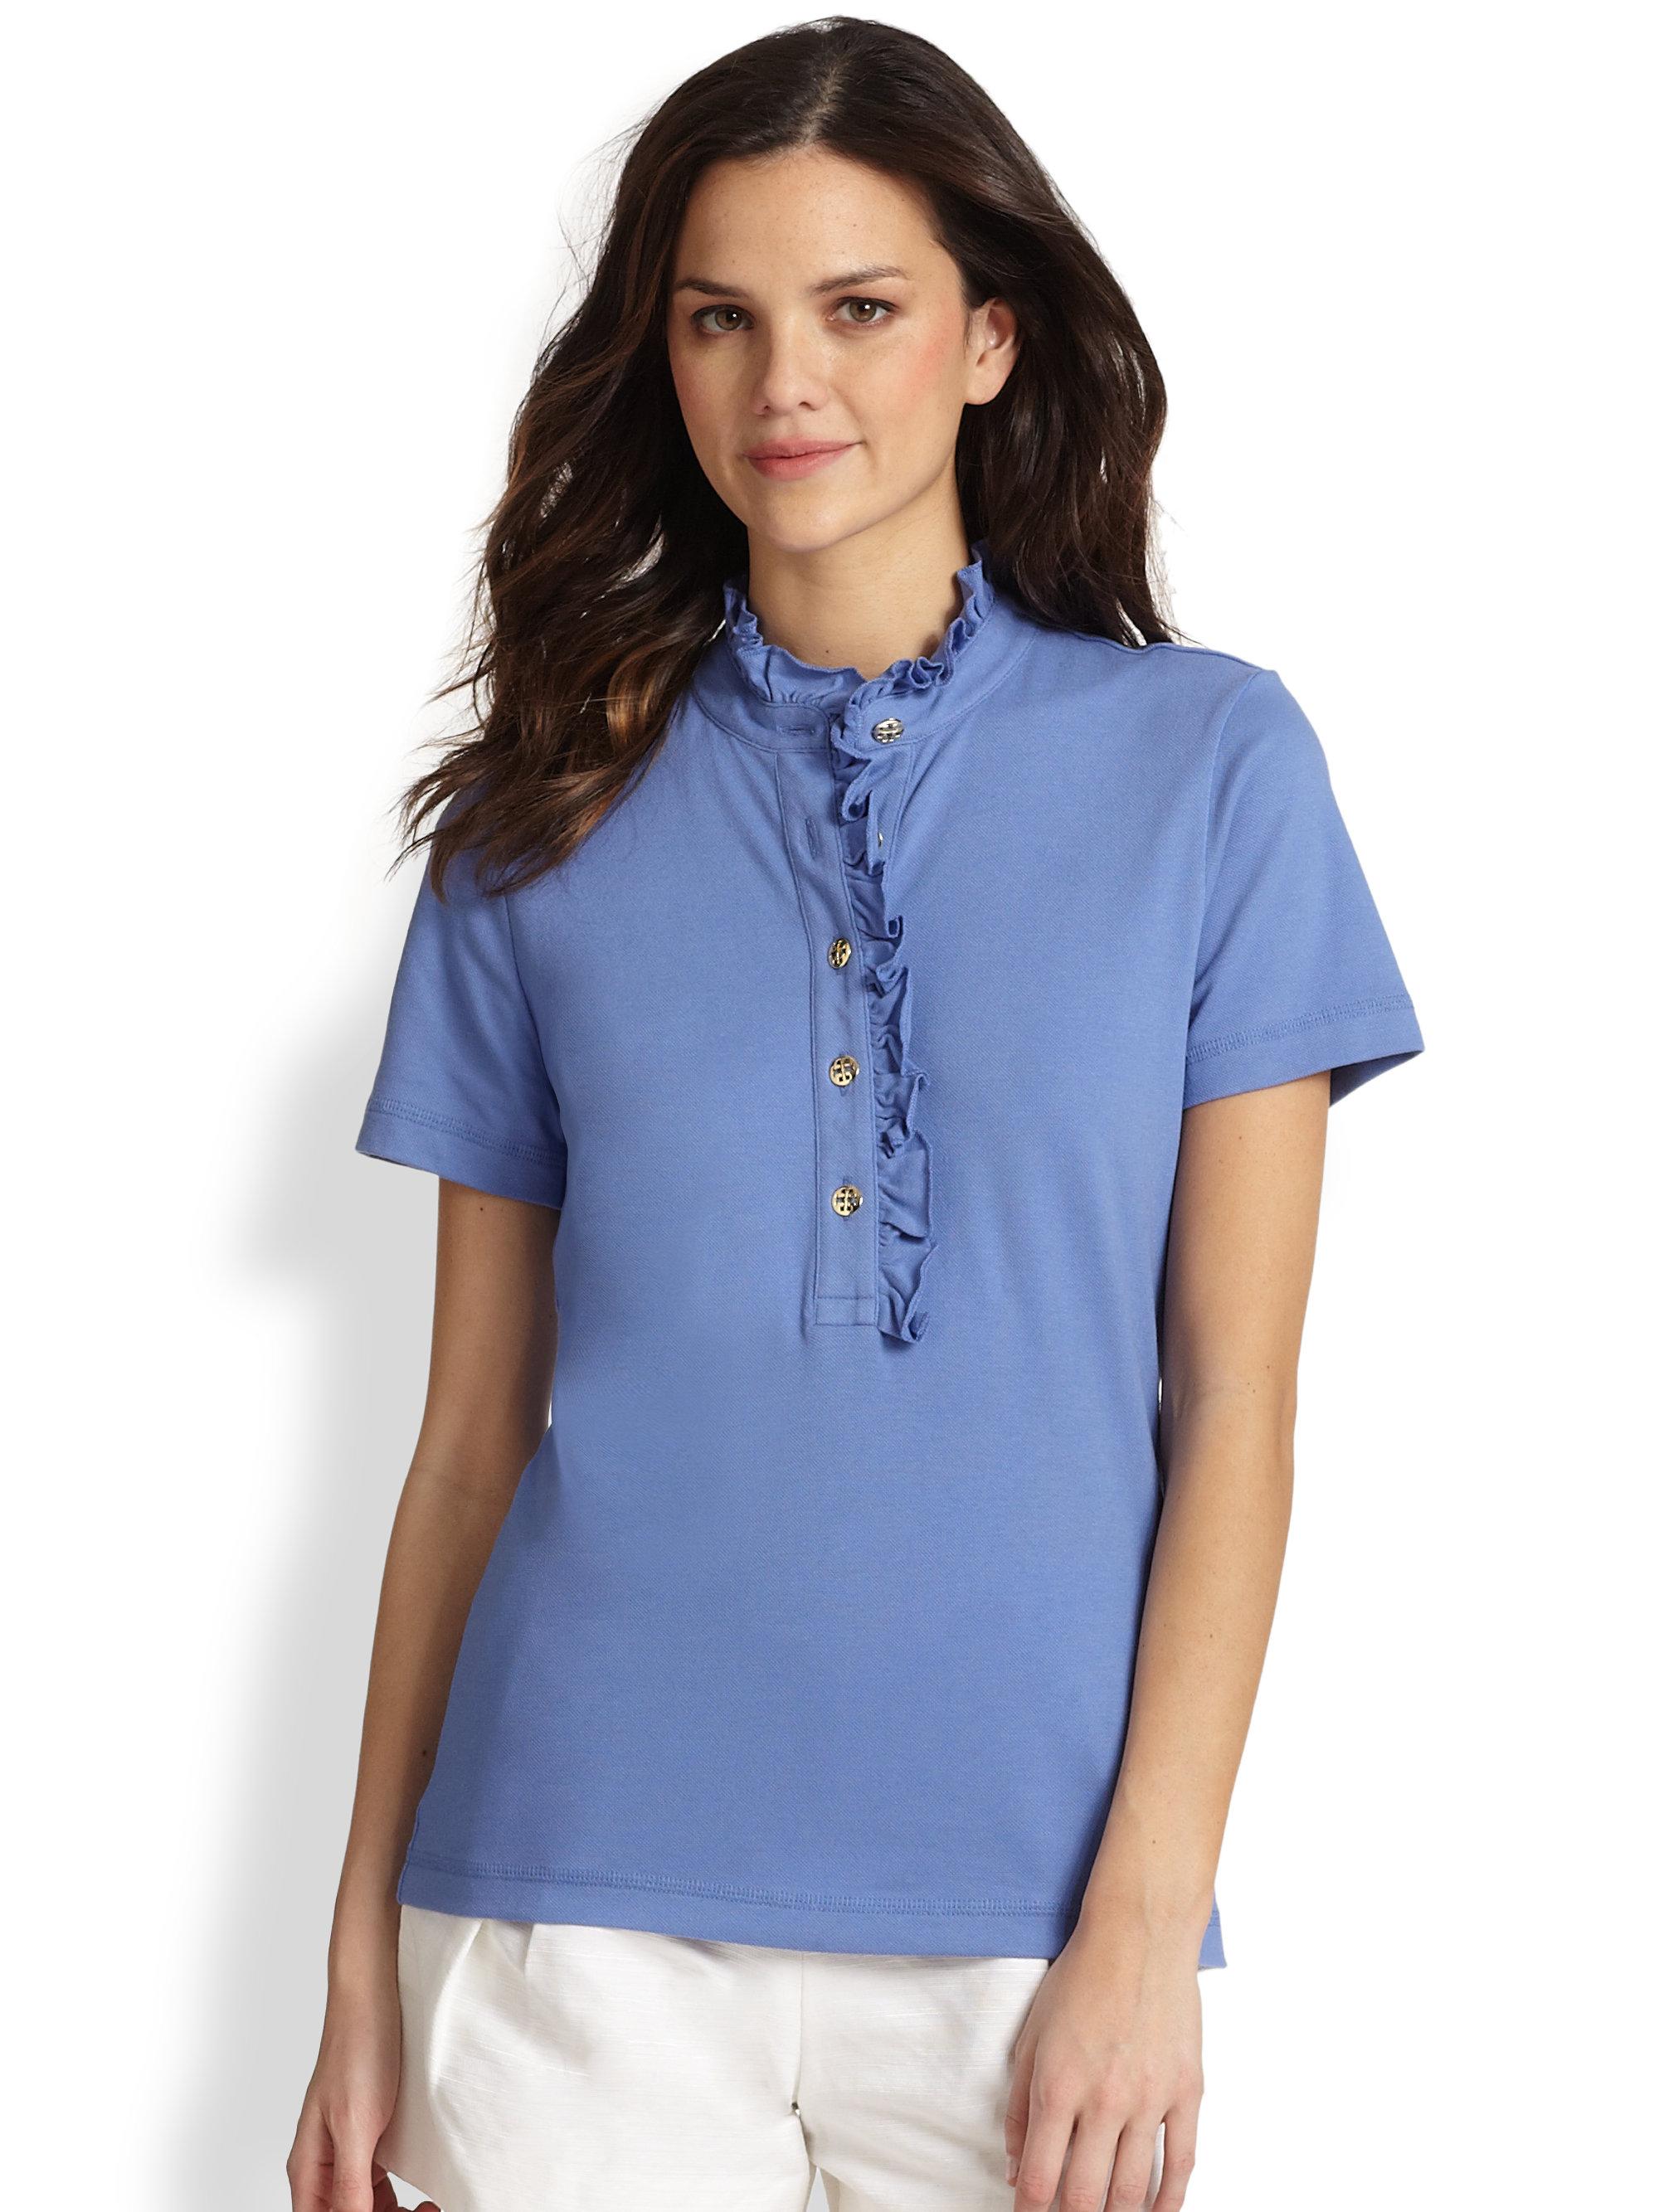 Tory Burch Lidia Ruffled Polo Shirt In Blue Wedge Blue